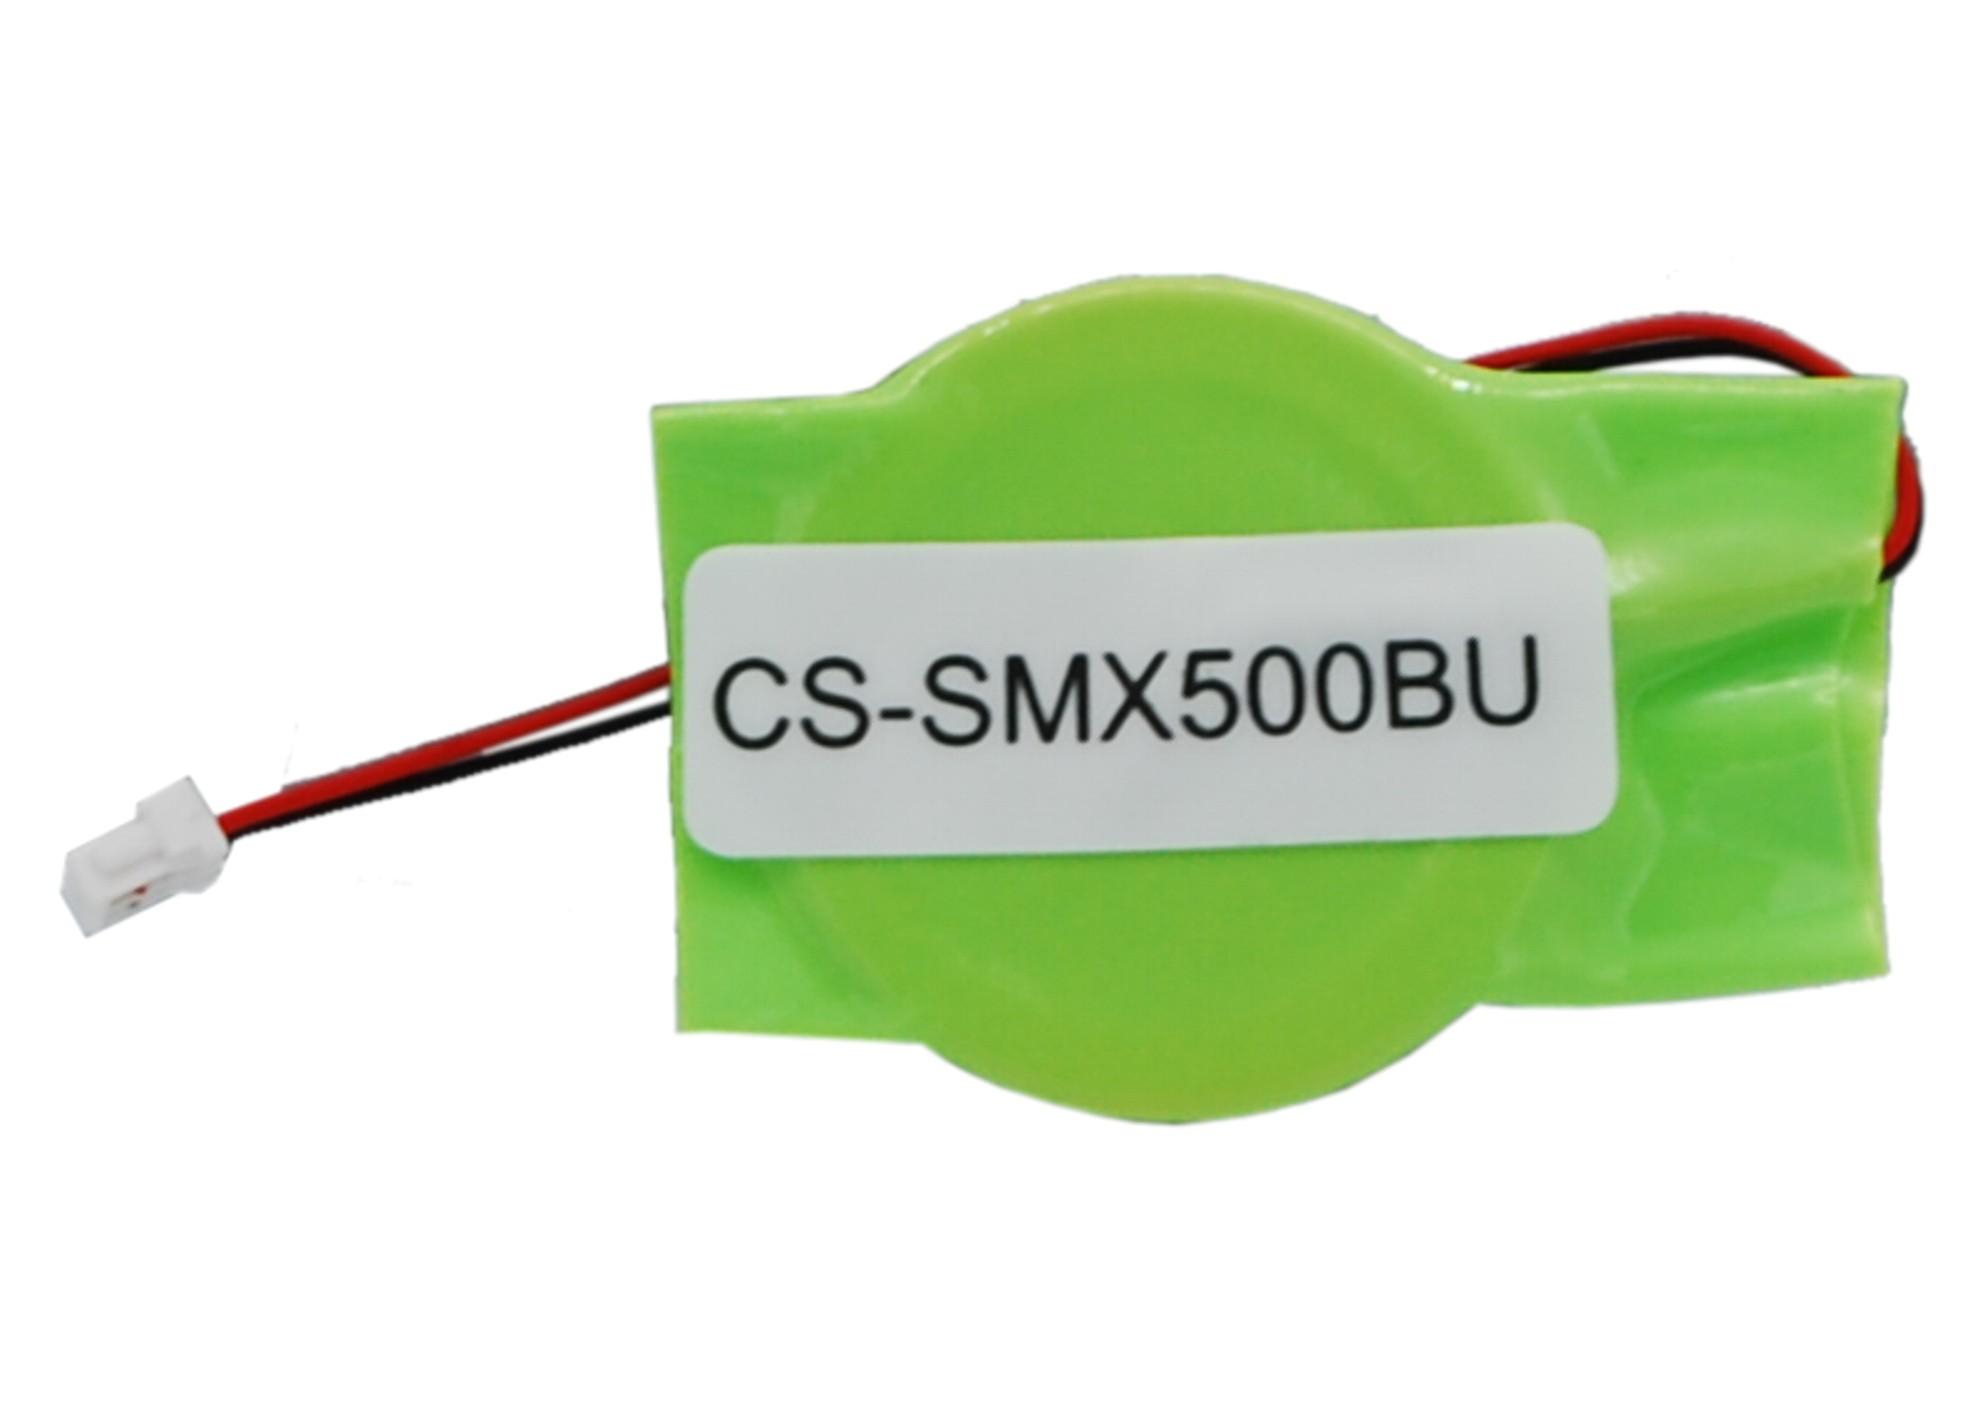 Cameron Sino baterie cmos pro SAMSUNG XE500C21 3V Li-ion 50mAh zelená - neoriginální